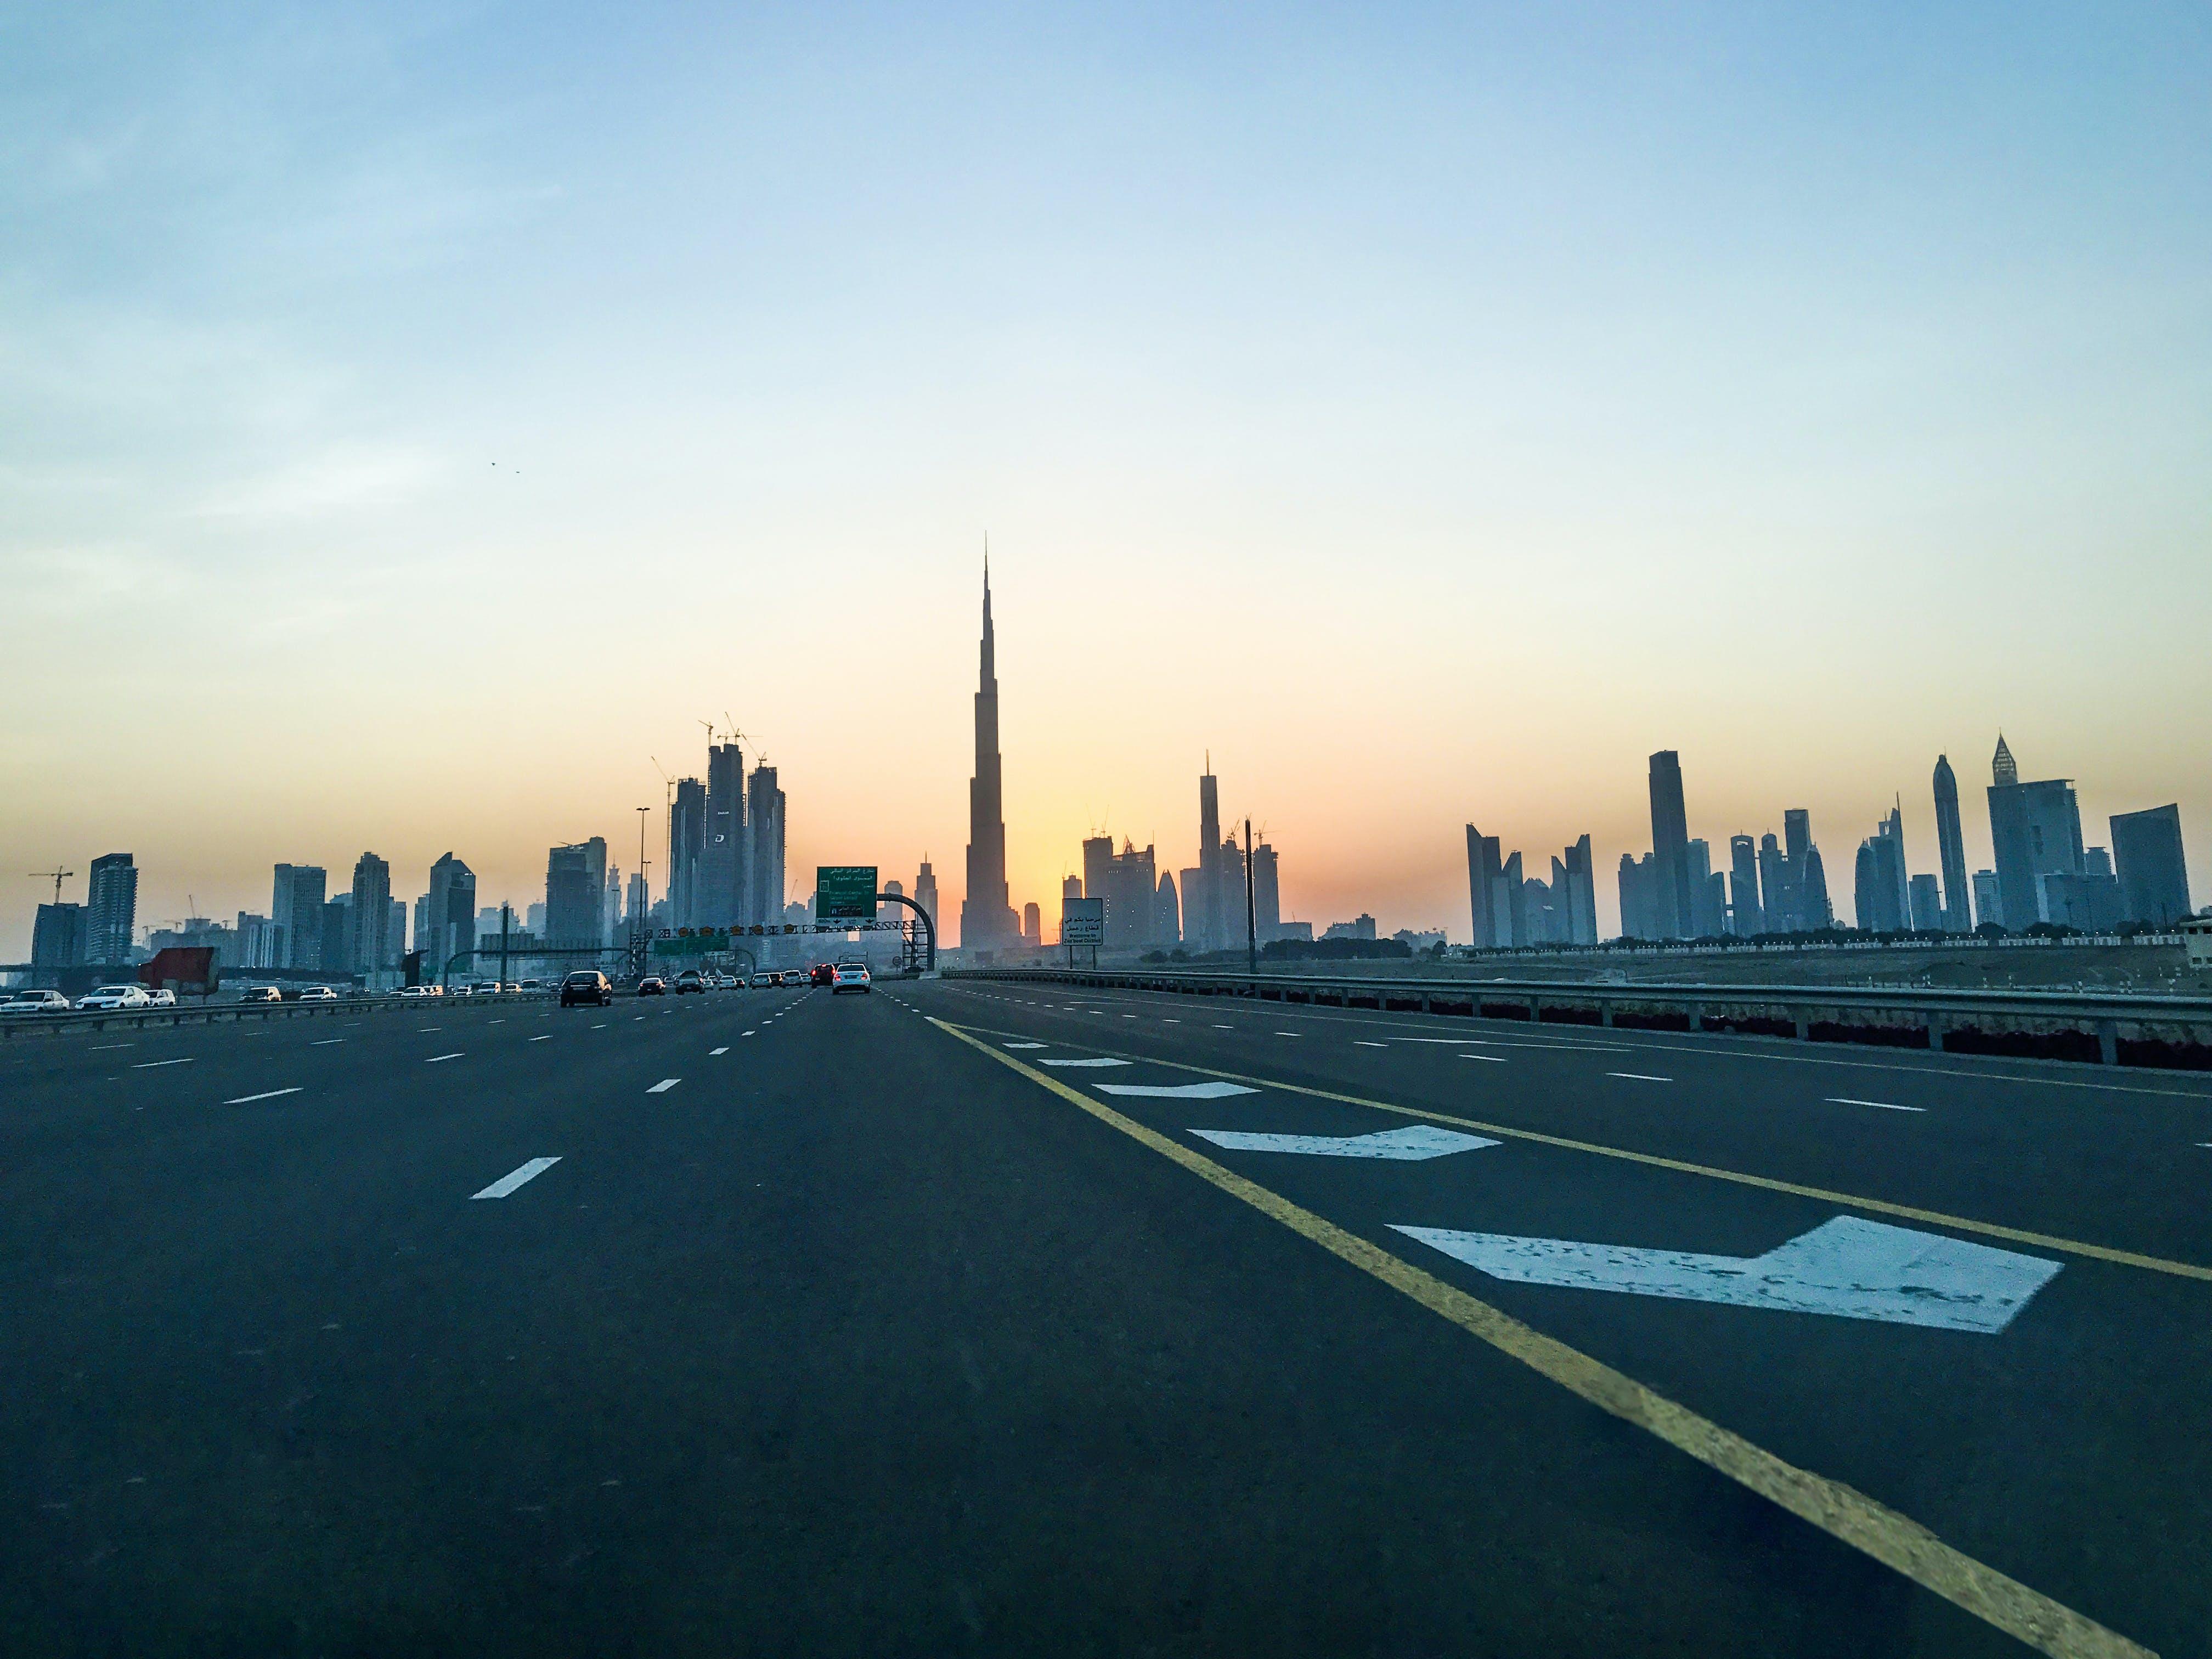 Free stock photo of building, burj khalifa, dubai, roads